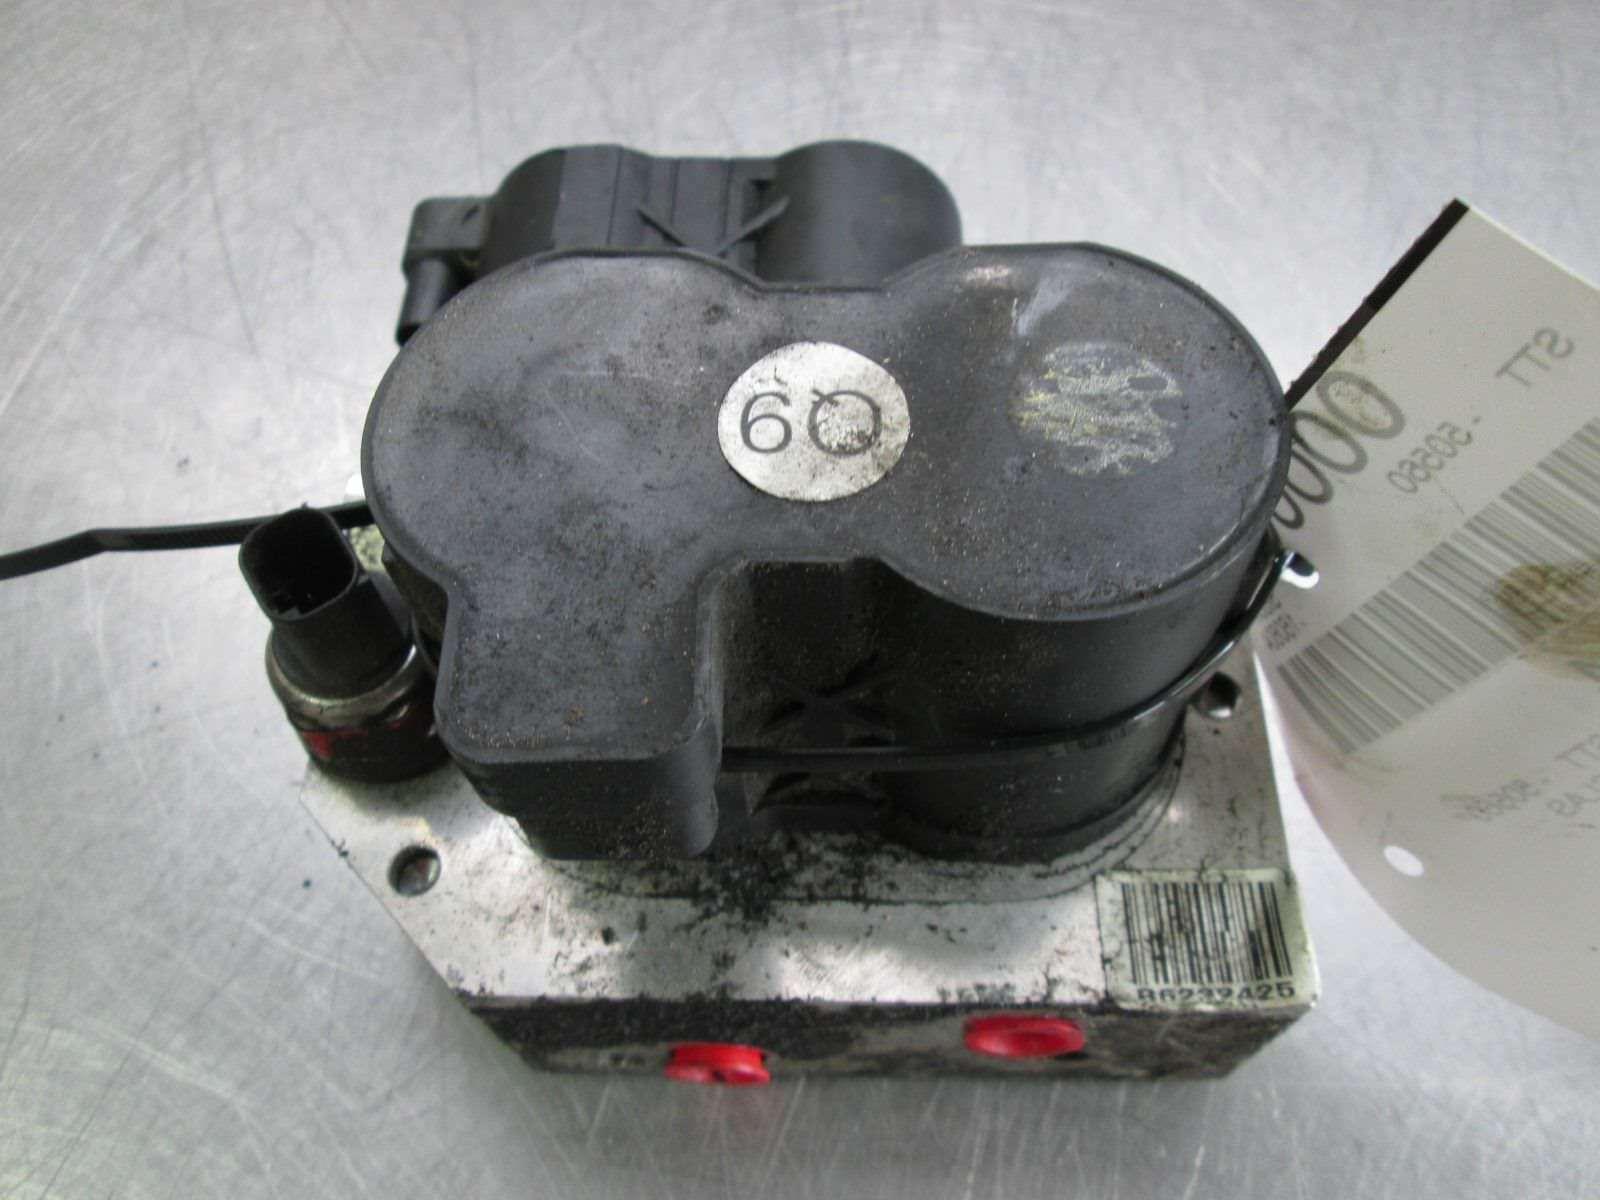 Rear Suspension ABC Hydraulic Valve Block 2213200358 Mercedes CL600 W216  2007